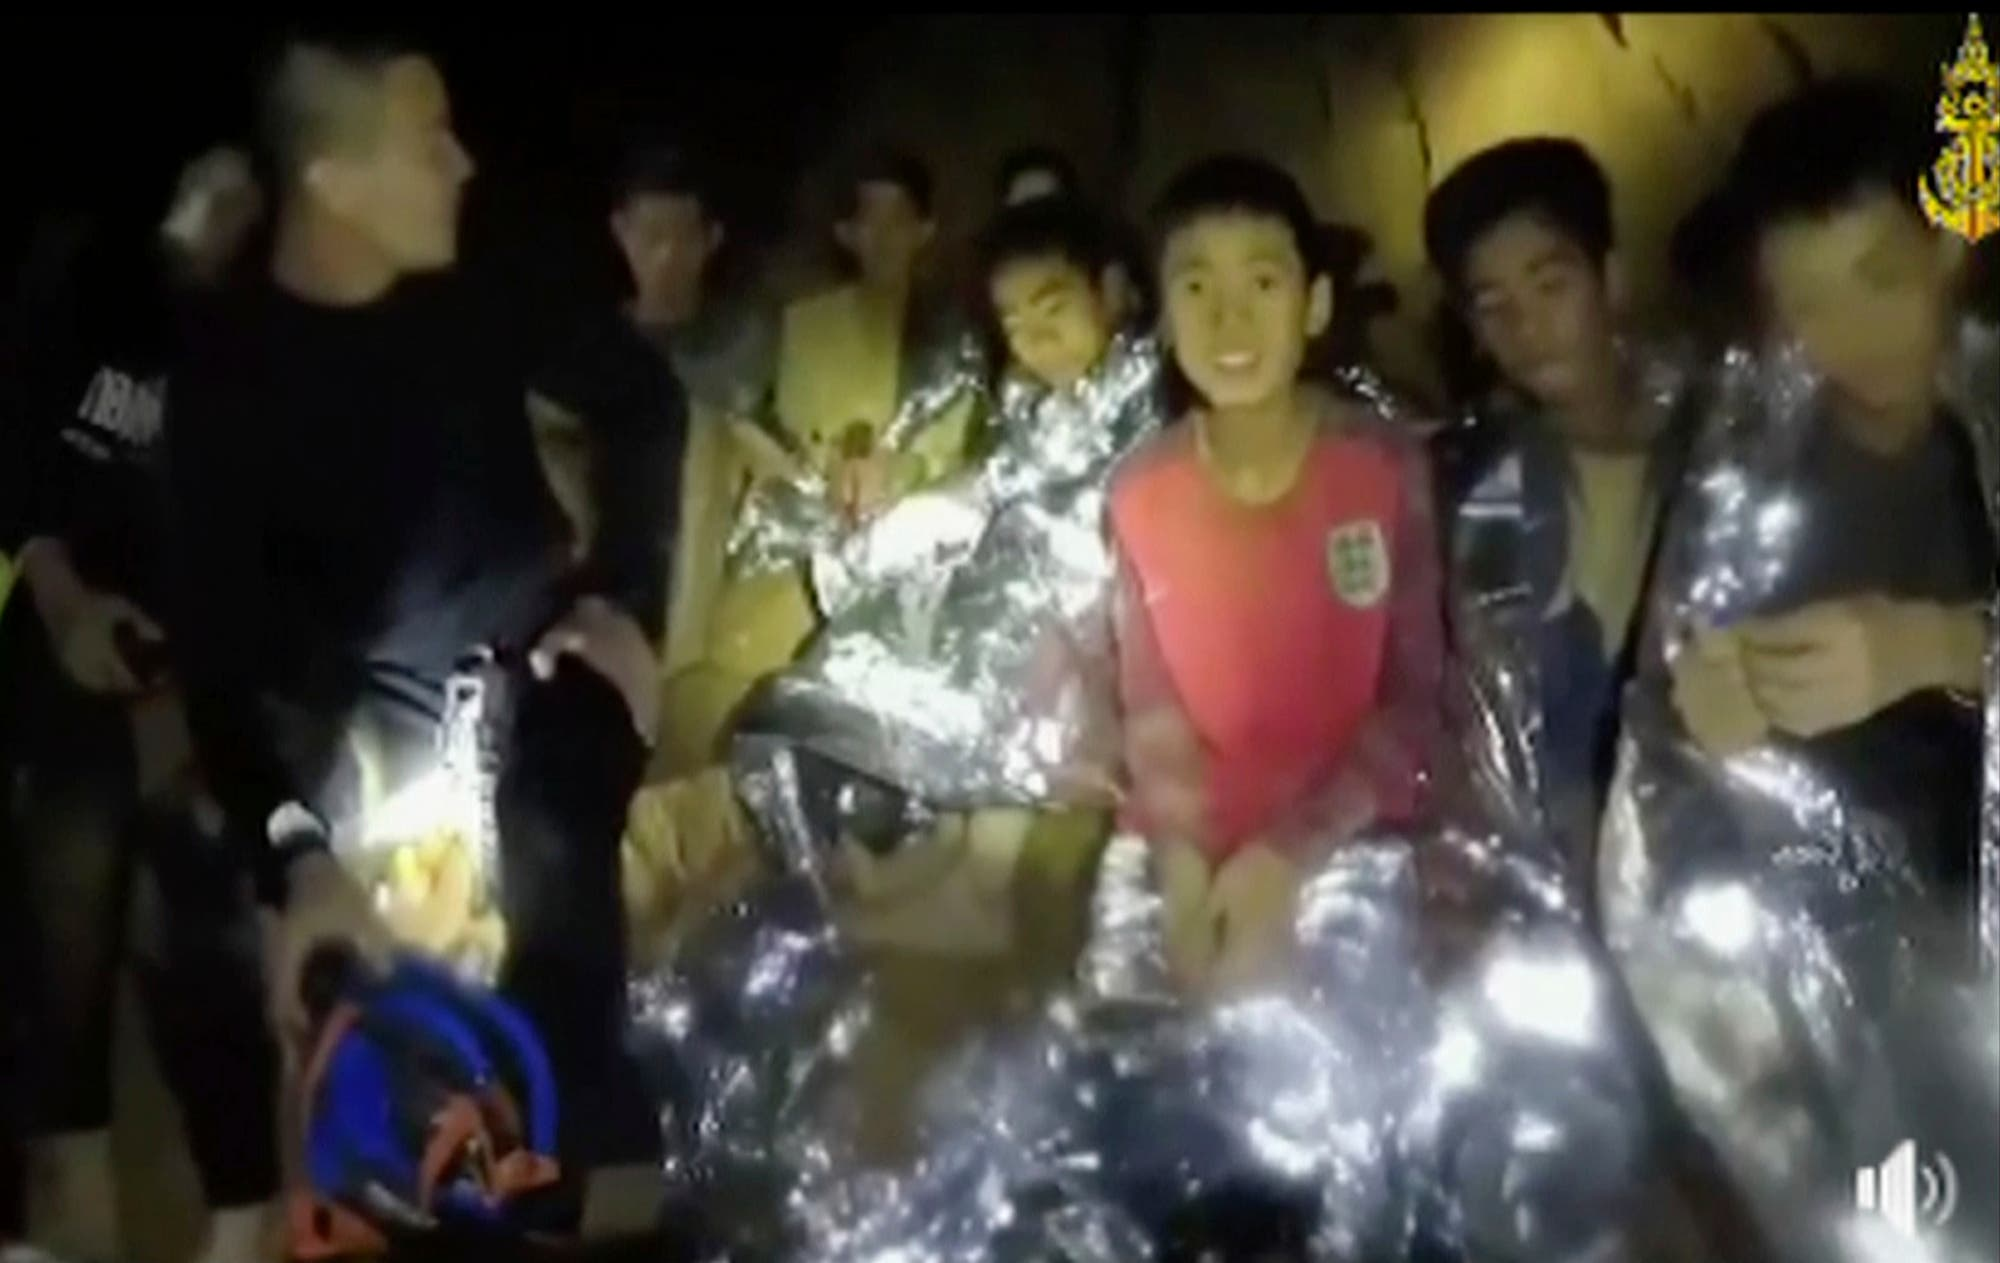 Thailand boys cave. (AP)